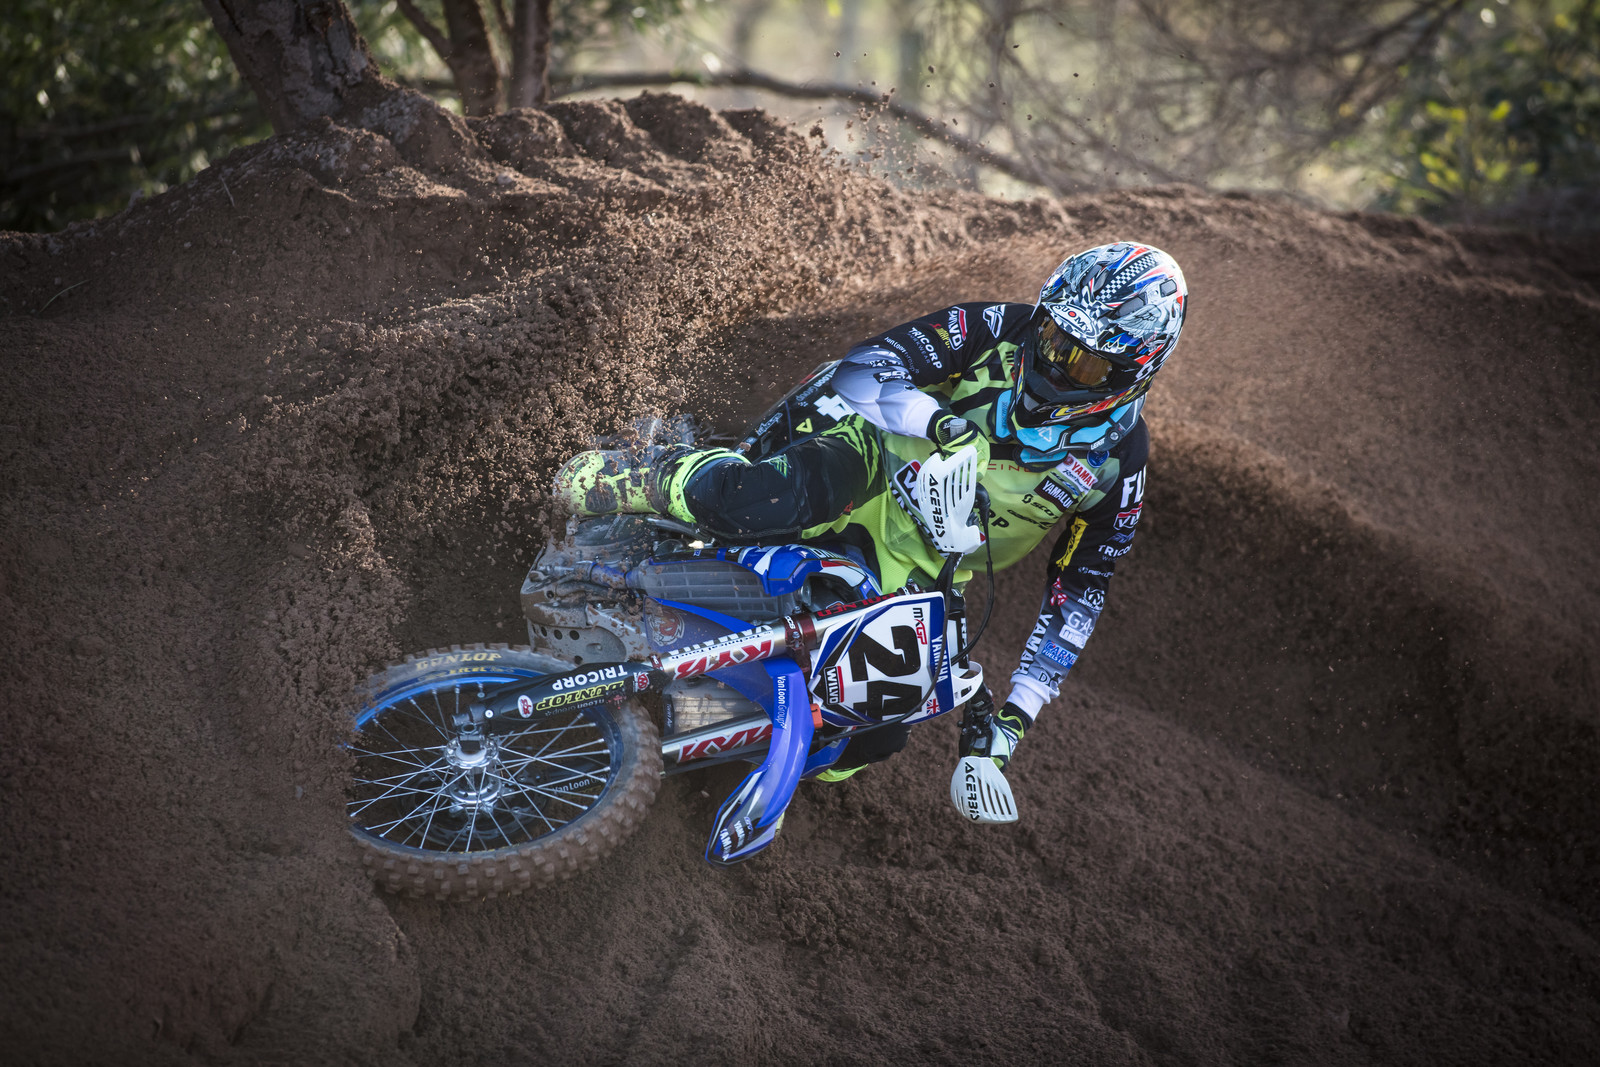 Shaun Simpson - First Look: 2017 Monster Energy & Wilvo Yamaha MXGP Teams - Motocross Pictures - Vital MX